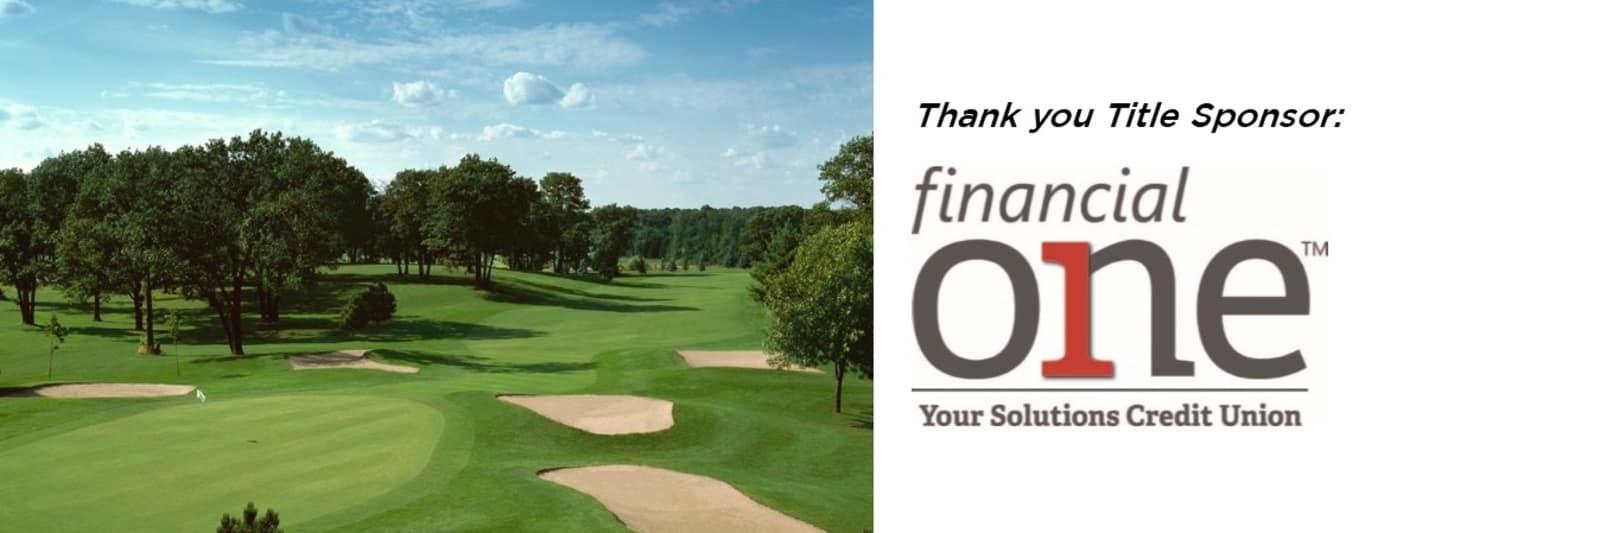 Golf-Slider-Final.jpg